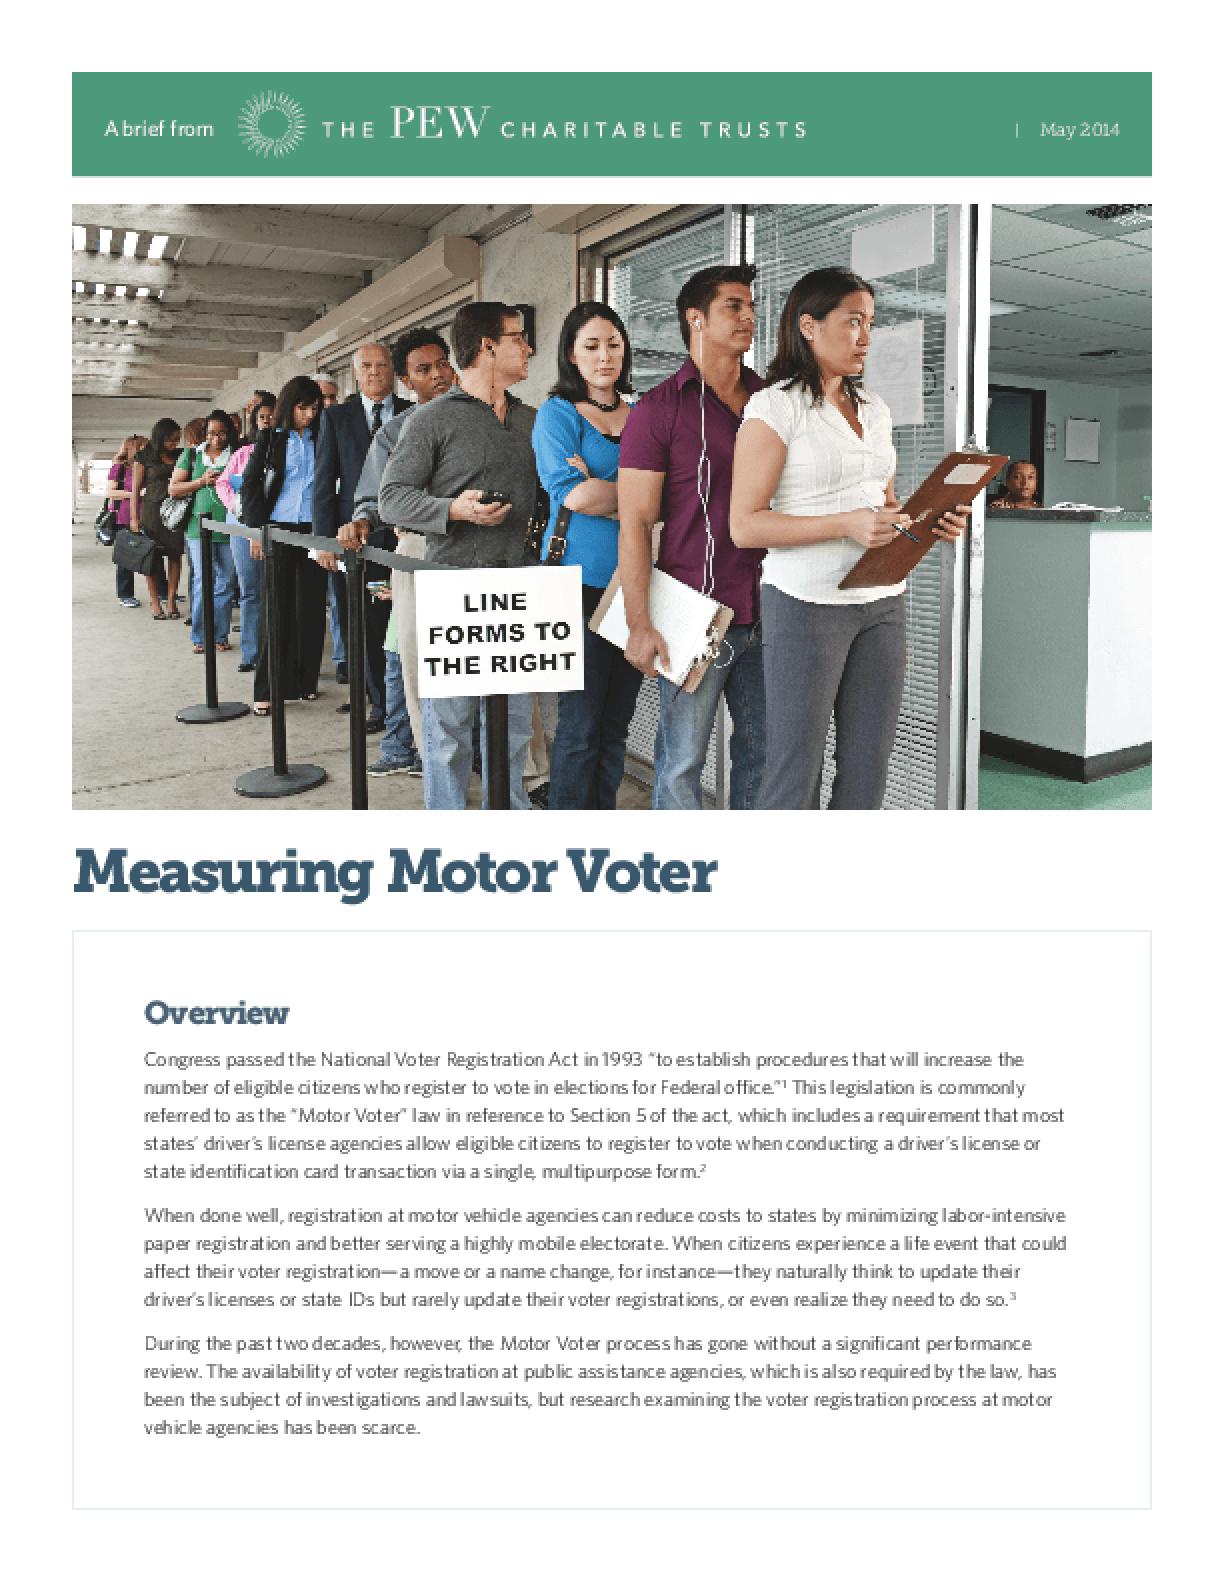 Measuring Motor Voter